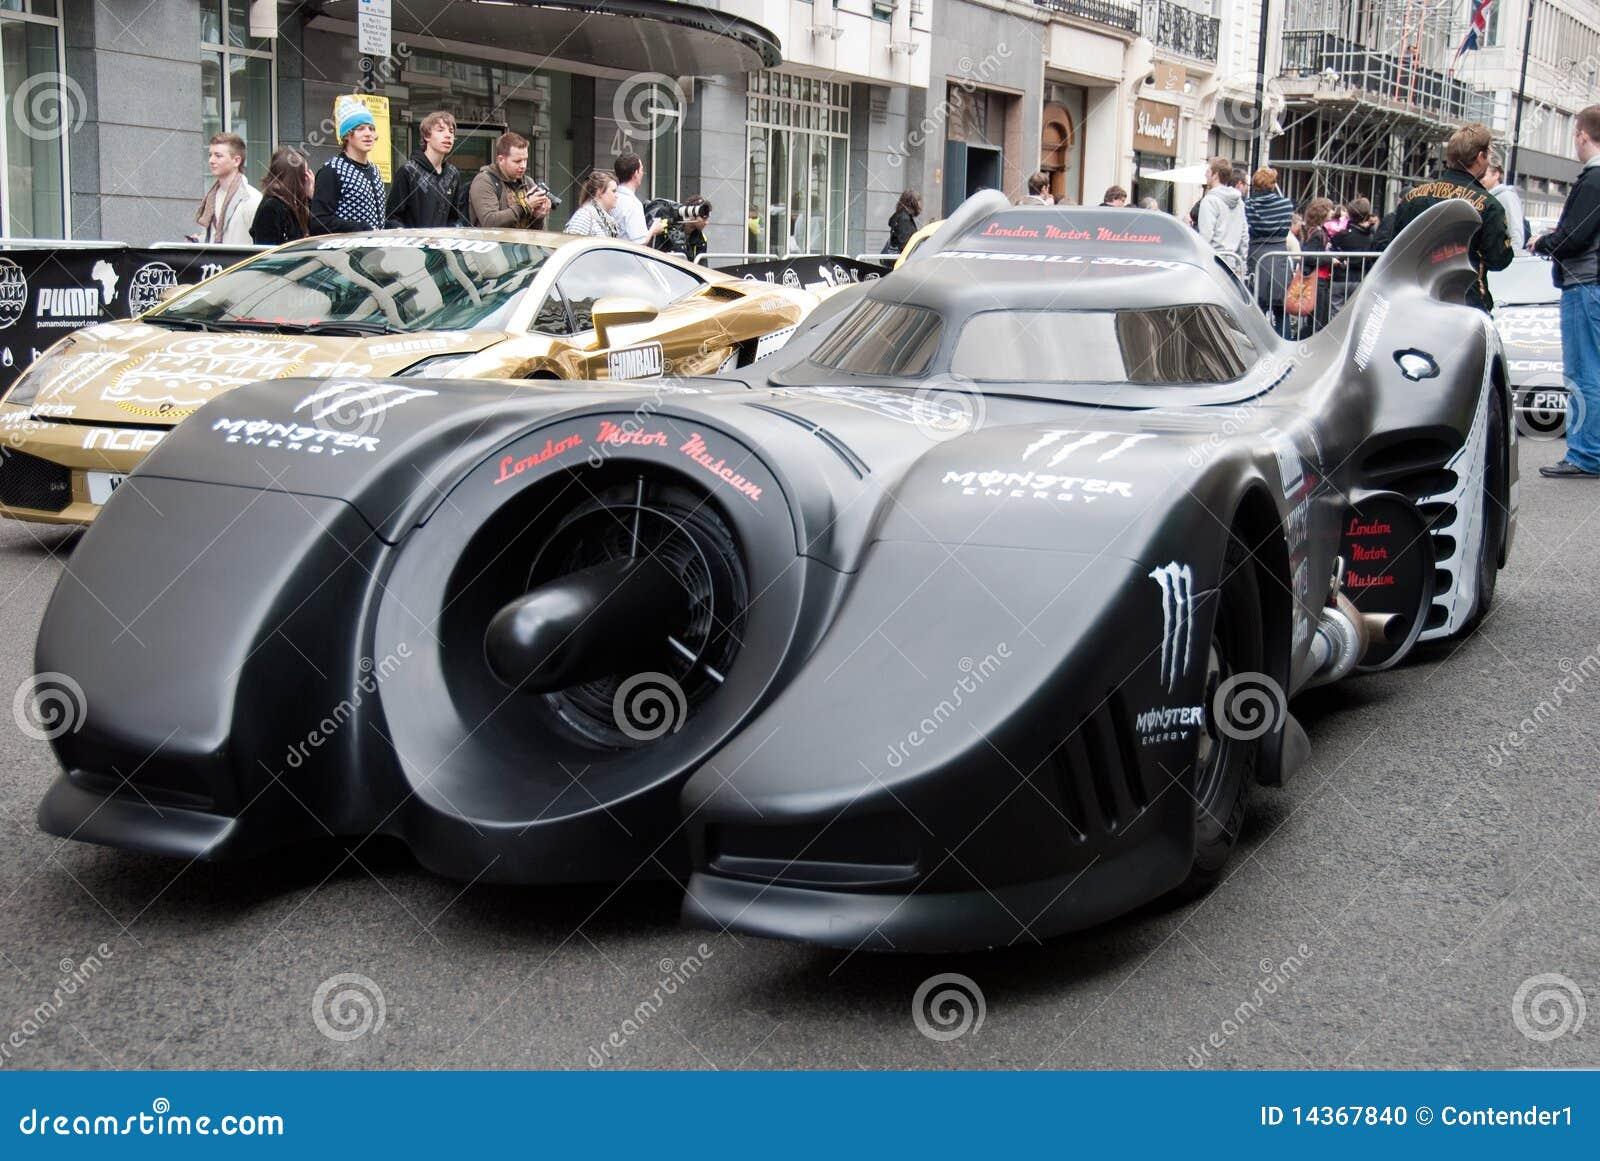 Batmobile novo Gumball 2010